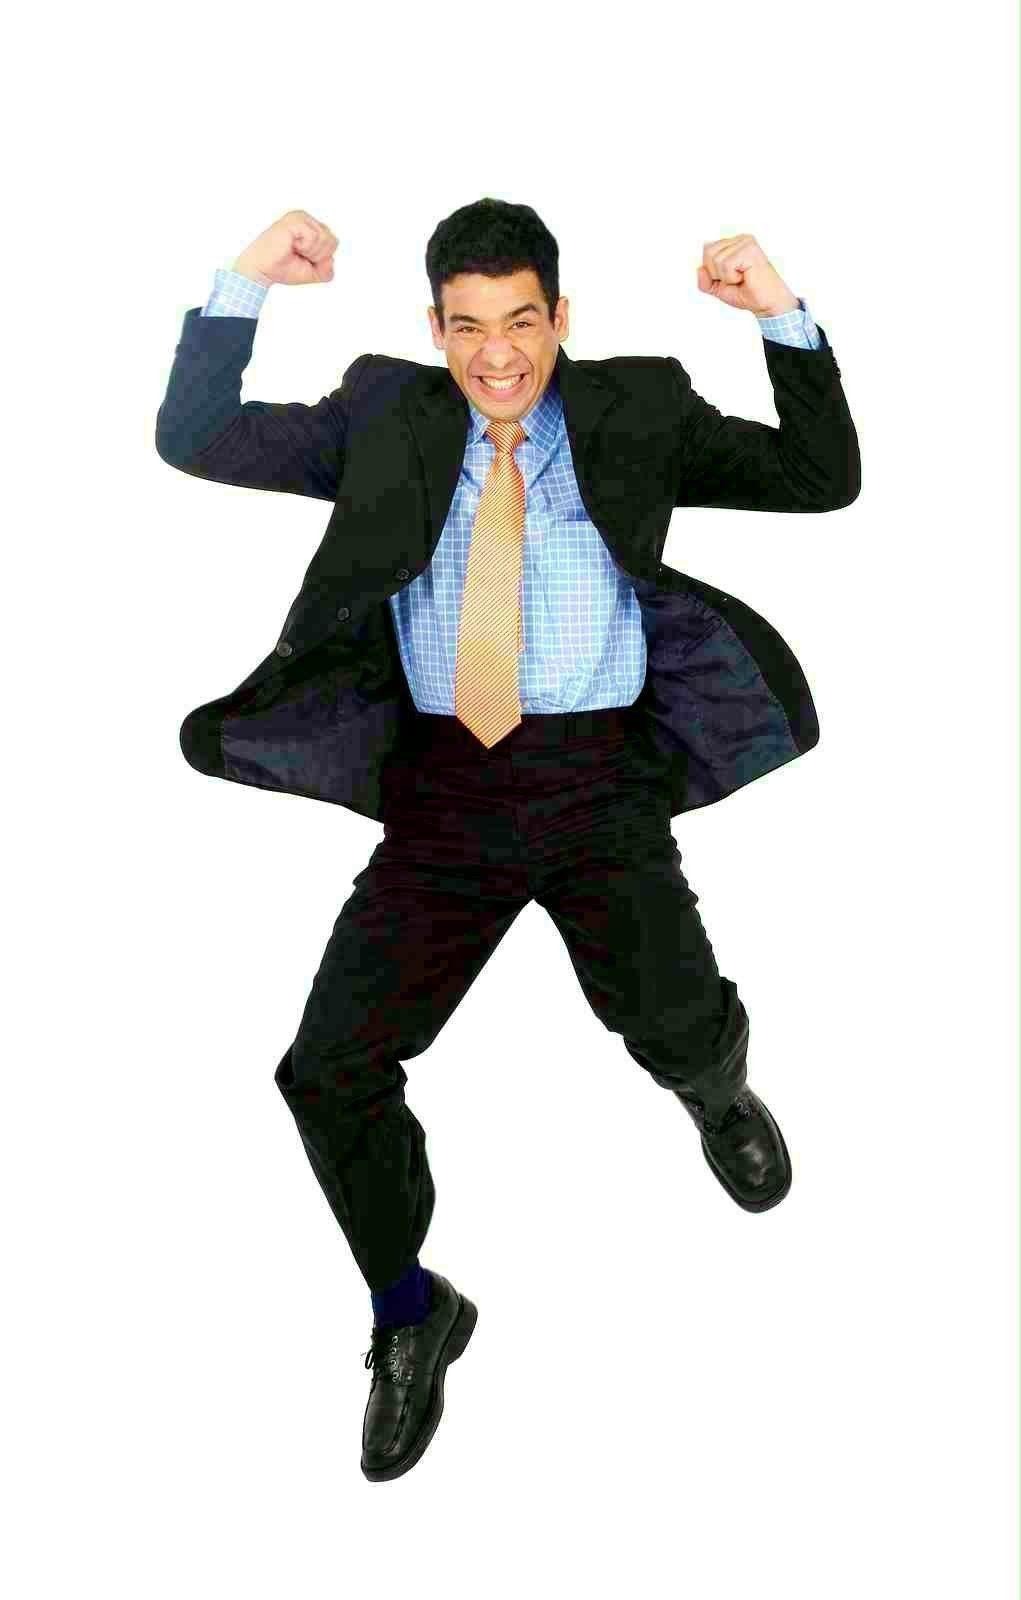 bigstockphoto_business_man_jumping_of_joy_2189597-lowres-business-man